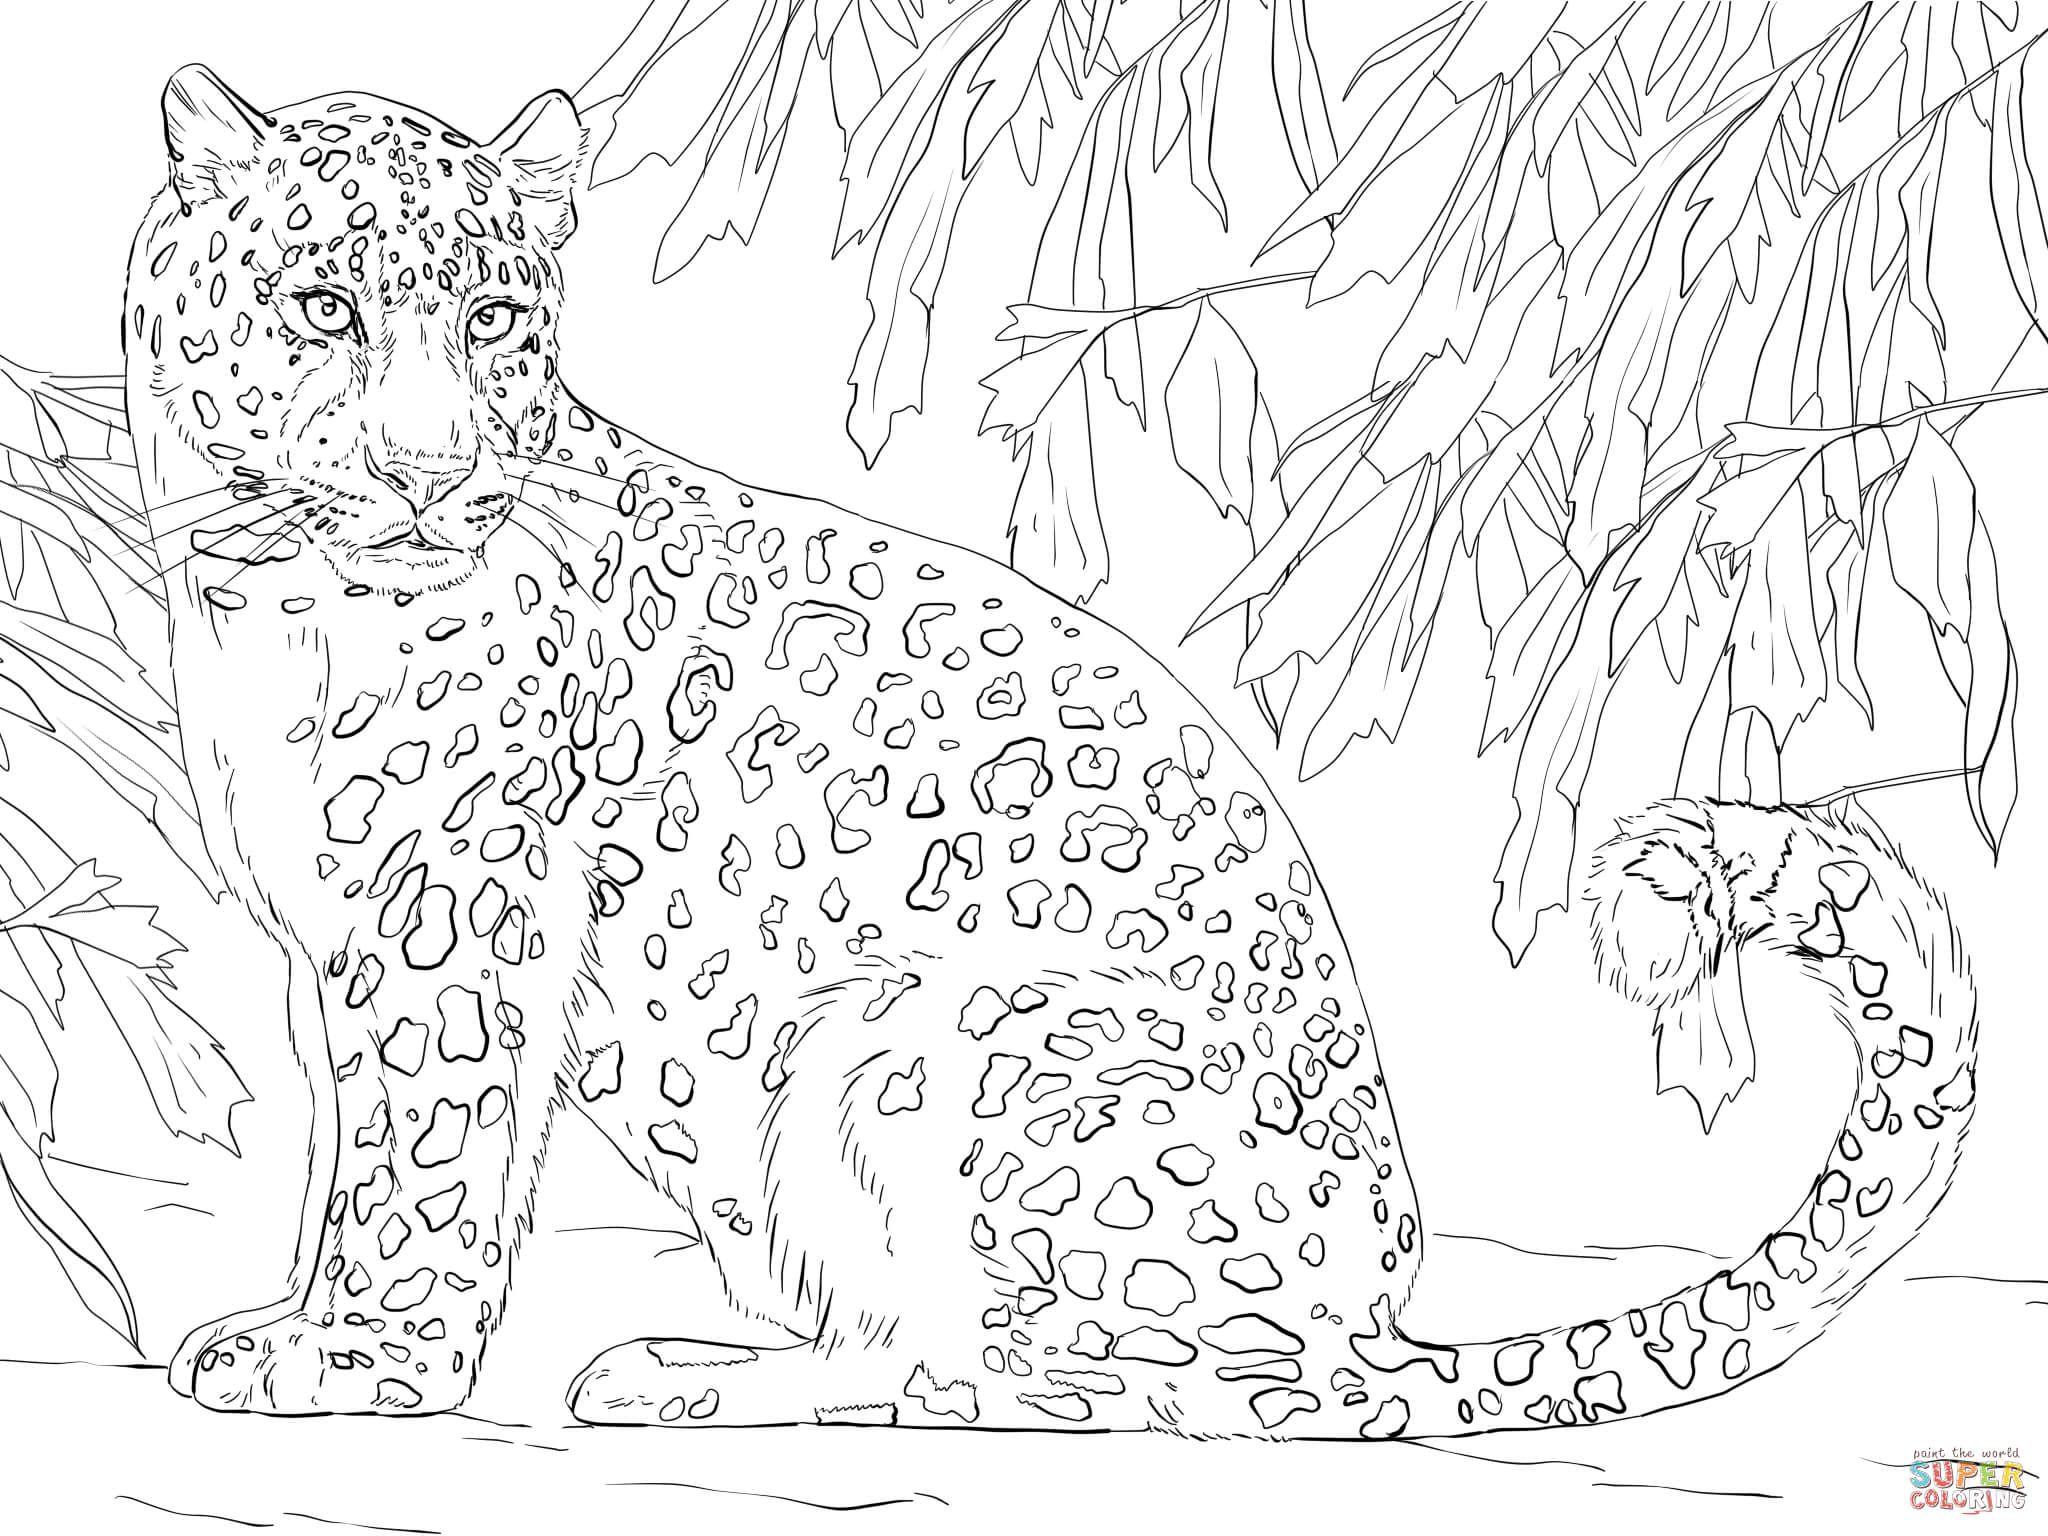 Amur Leopard Super Coloring Coloring Book Art Leopard Drawing Coloring Pages [ 1536 x 2048 Pixel ]